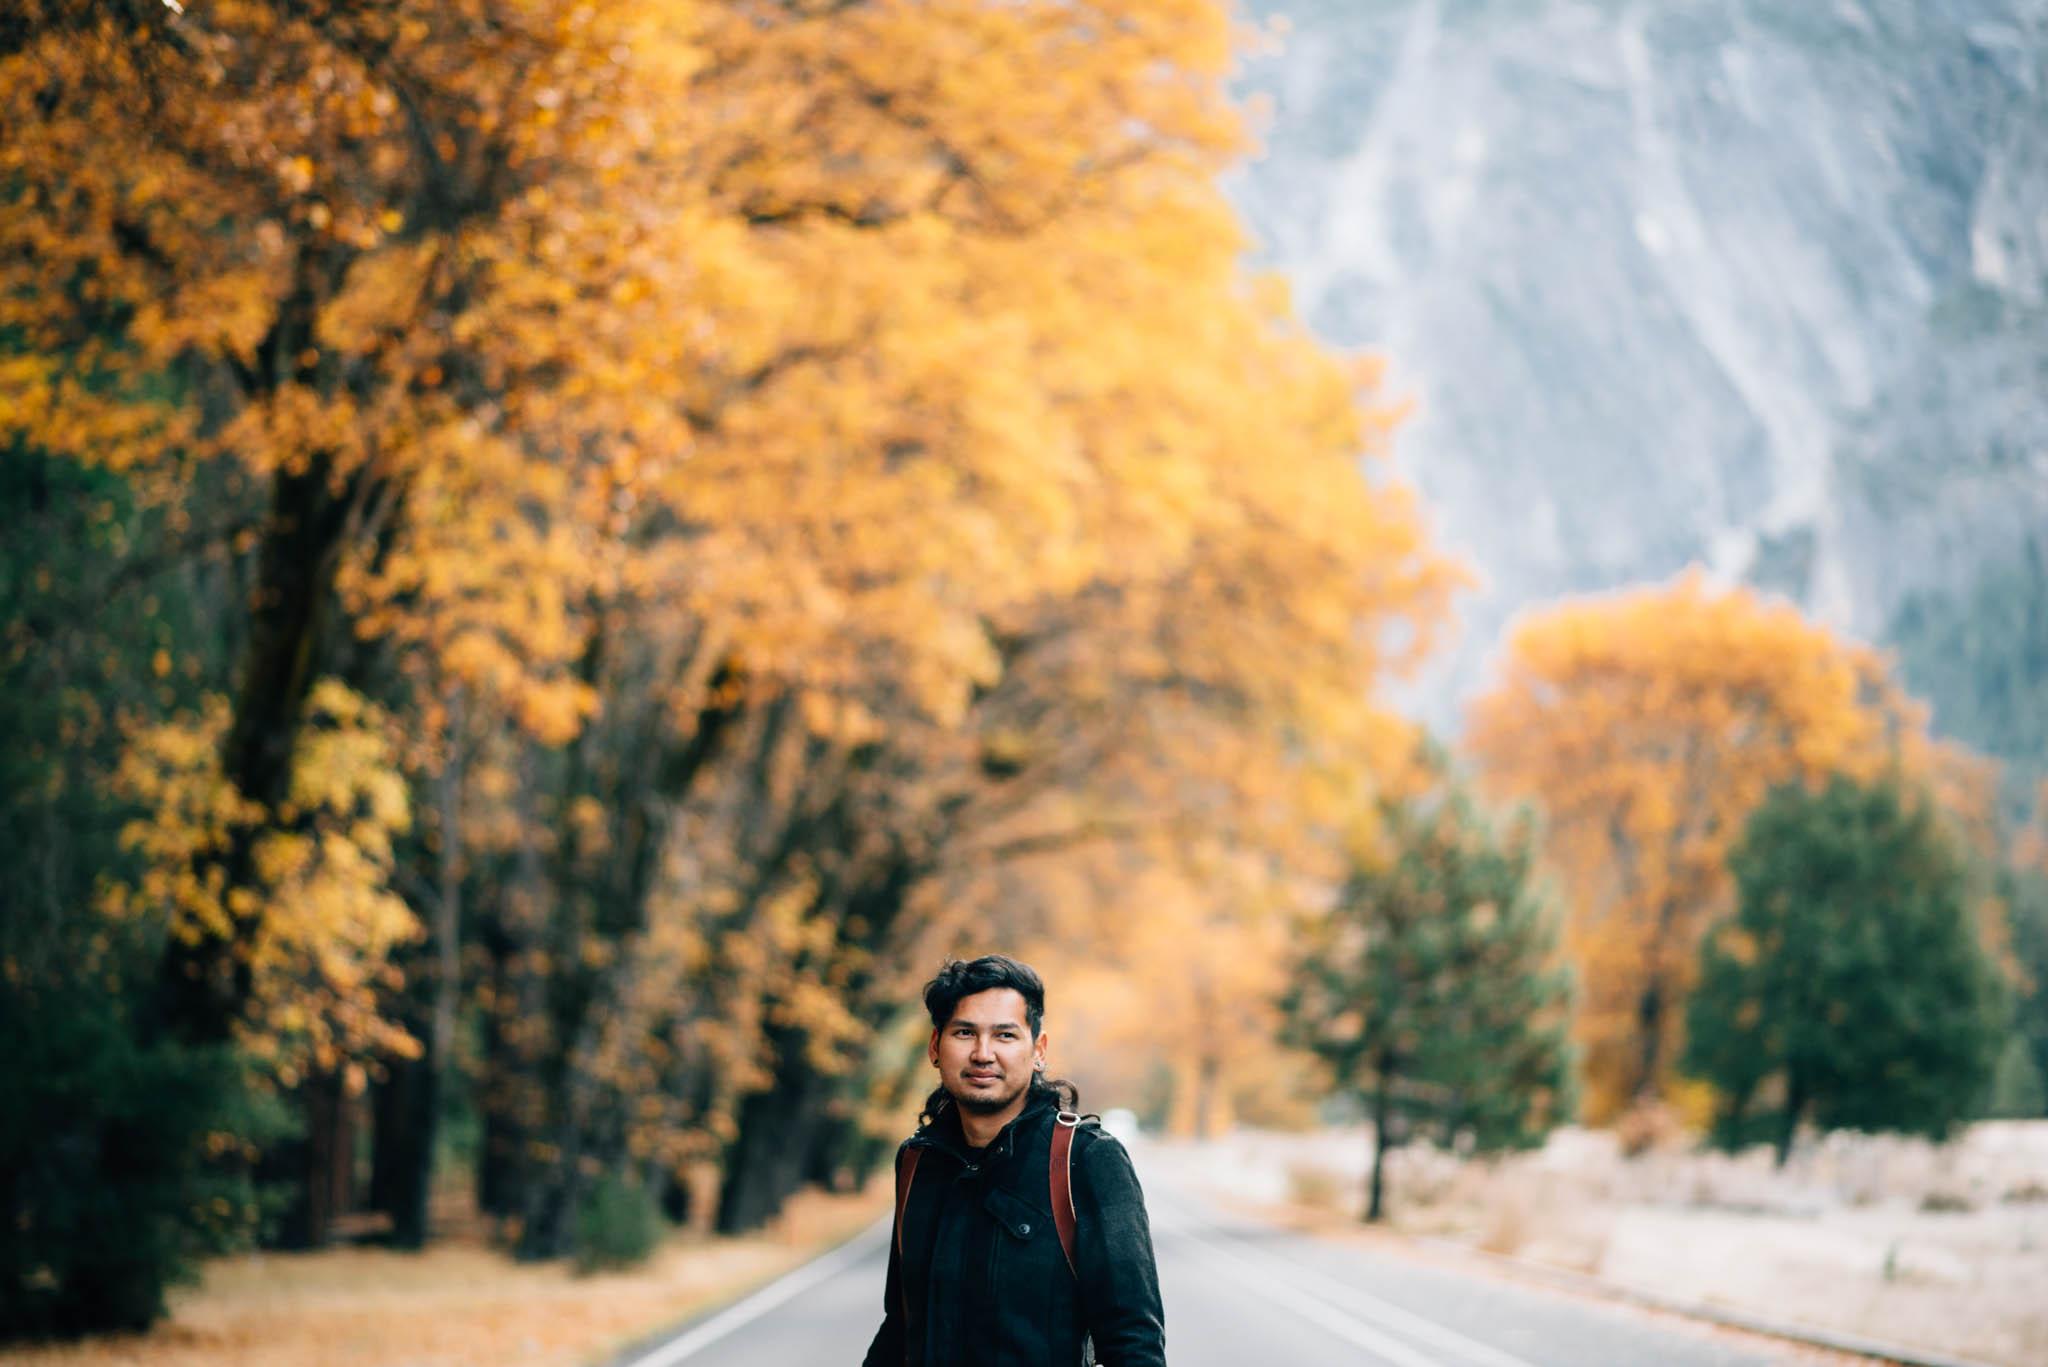 ©Isaiah & Taylor Photography - Los Angeles Destination Photographer - Lifestyle Commercial Yosemite Jesse-2.jpg